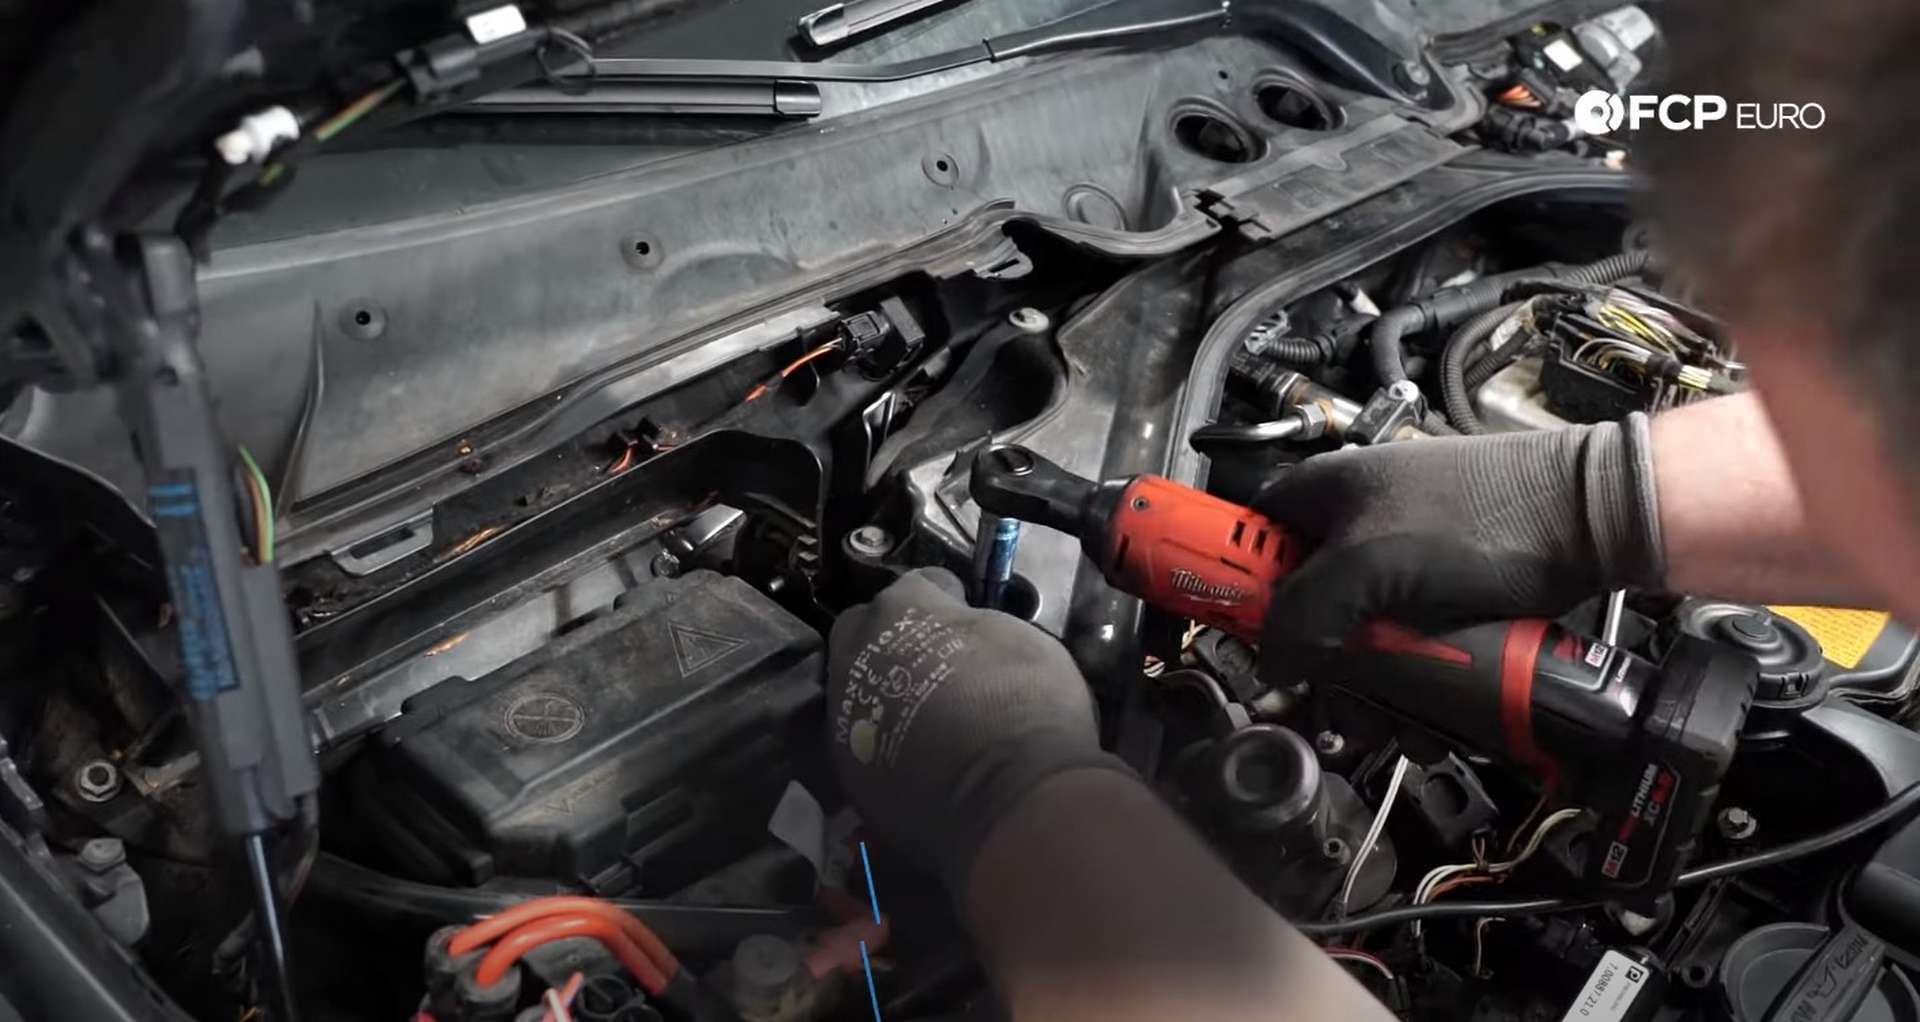 06-DIY-BMW-F30-High-Pressure-Fuel-Pump-Replacement_Exposing-Injectors